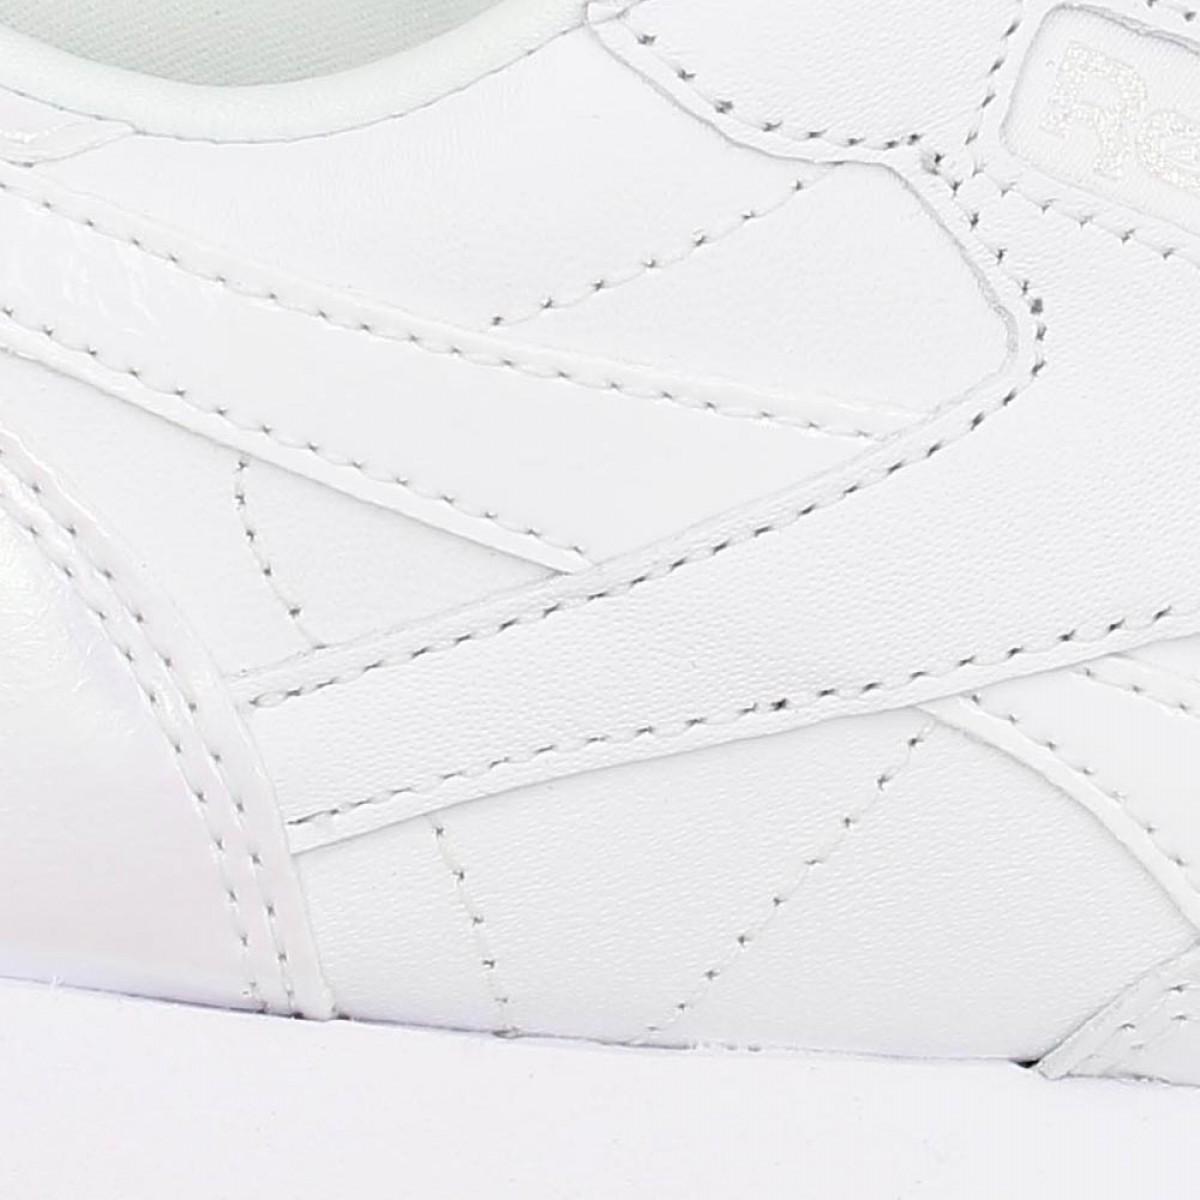 6aada9055694 Reebok Classic Leather Cuir Femme White Ice Femme